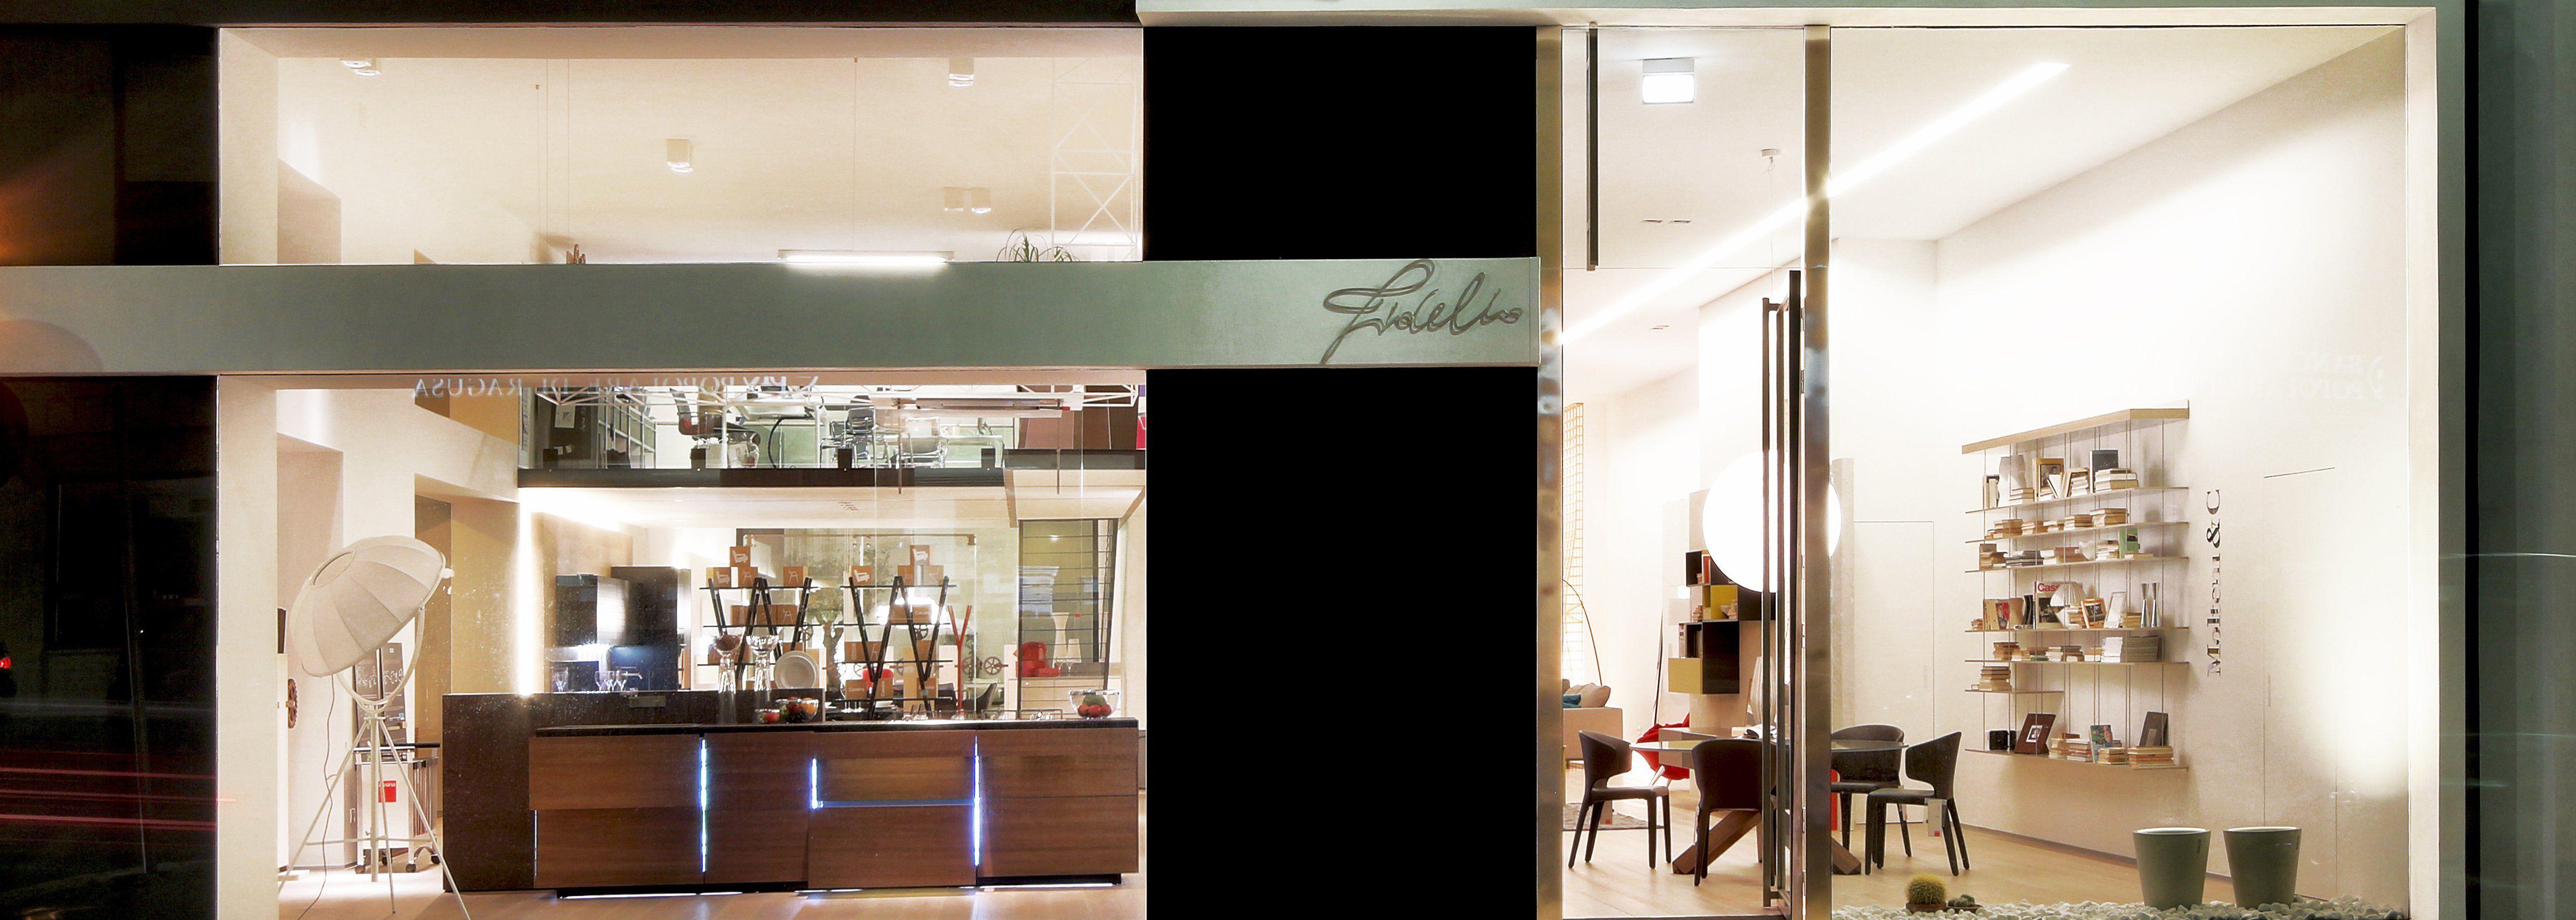 Fidelio Studio